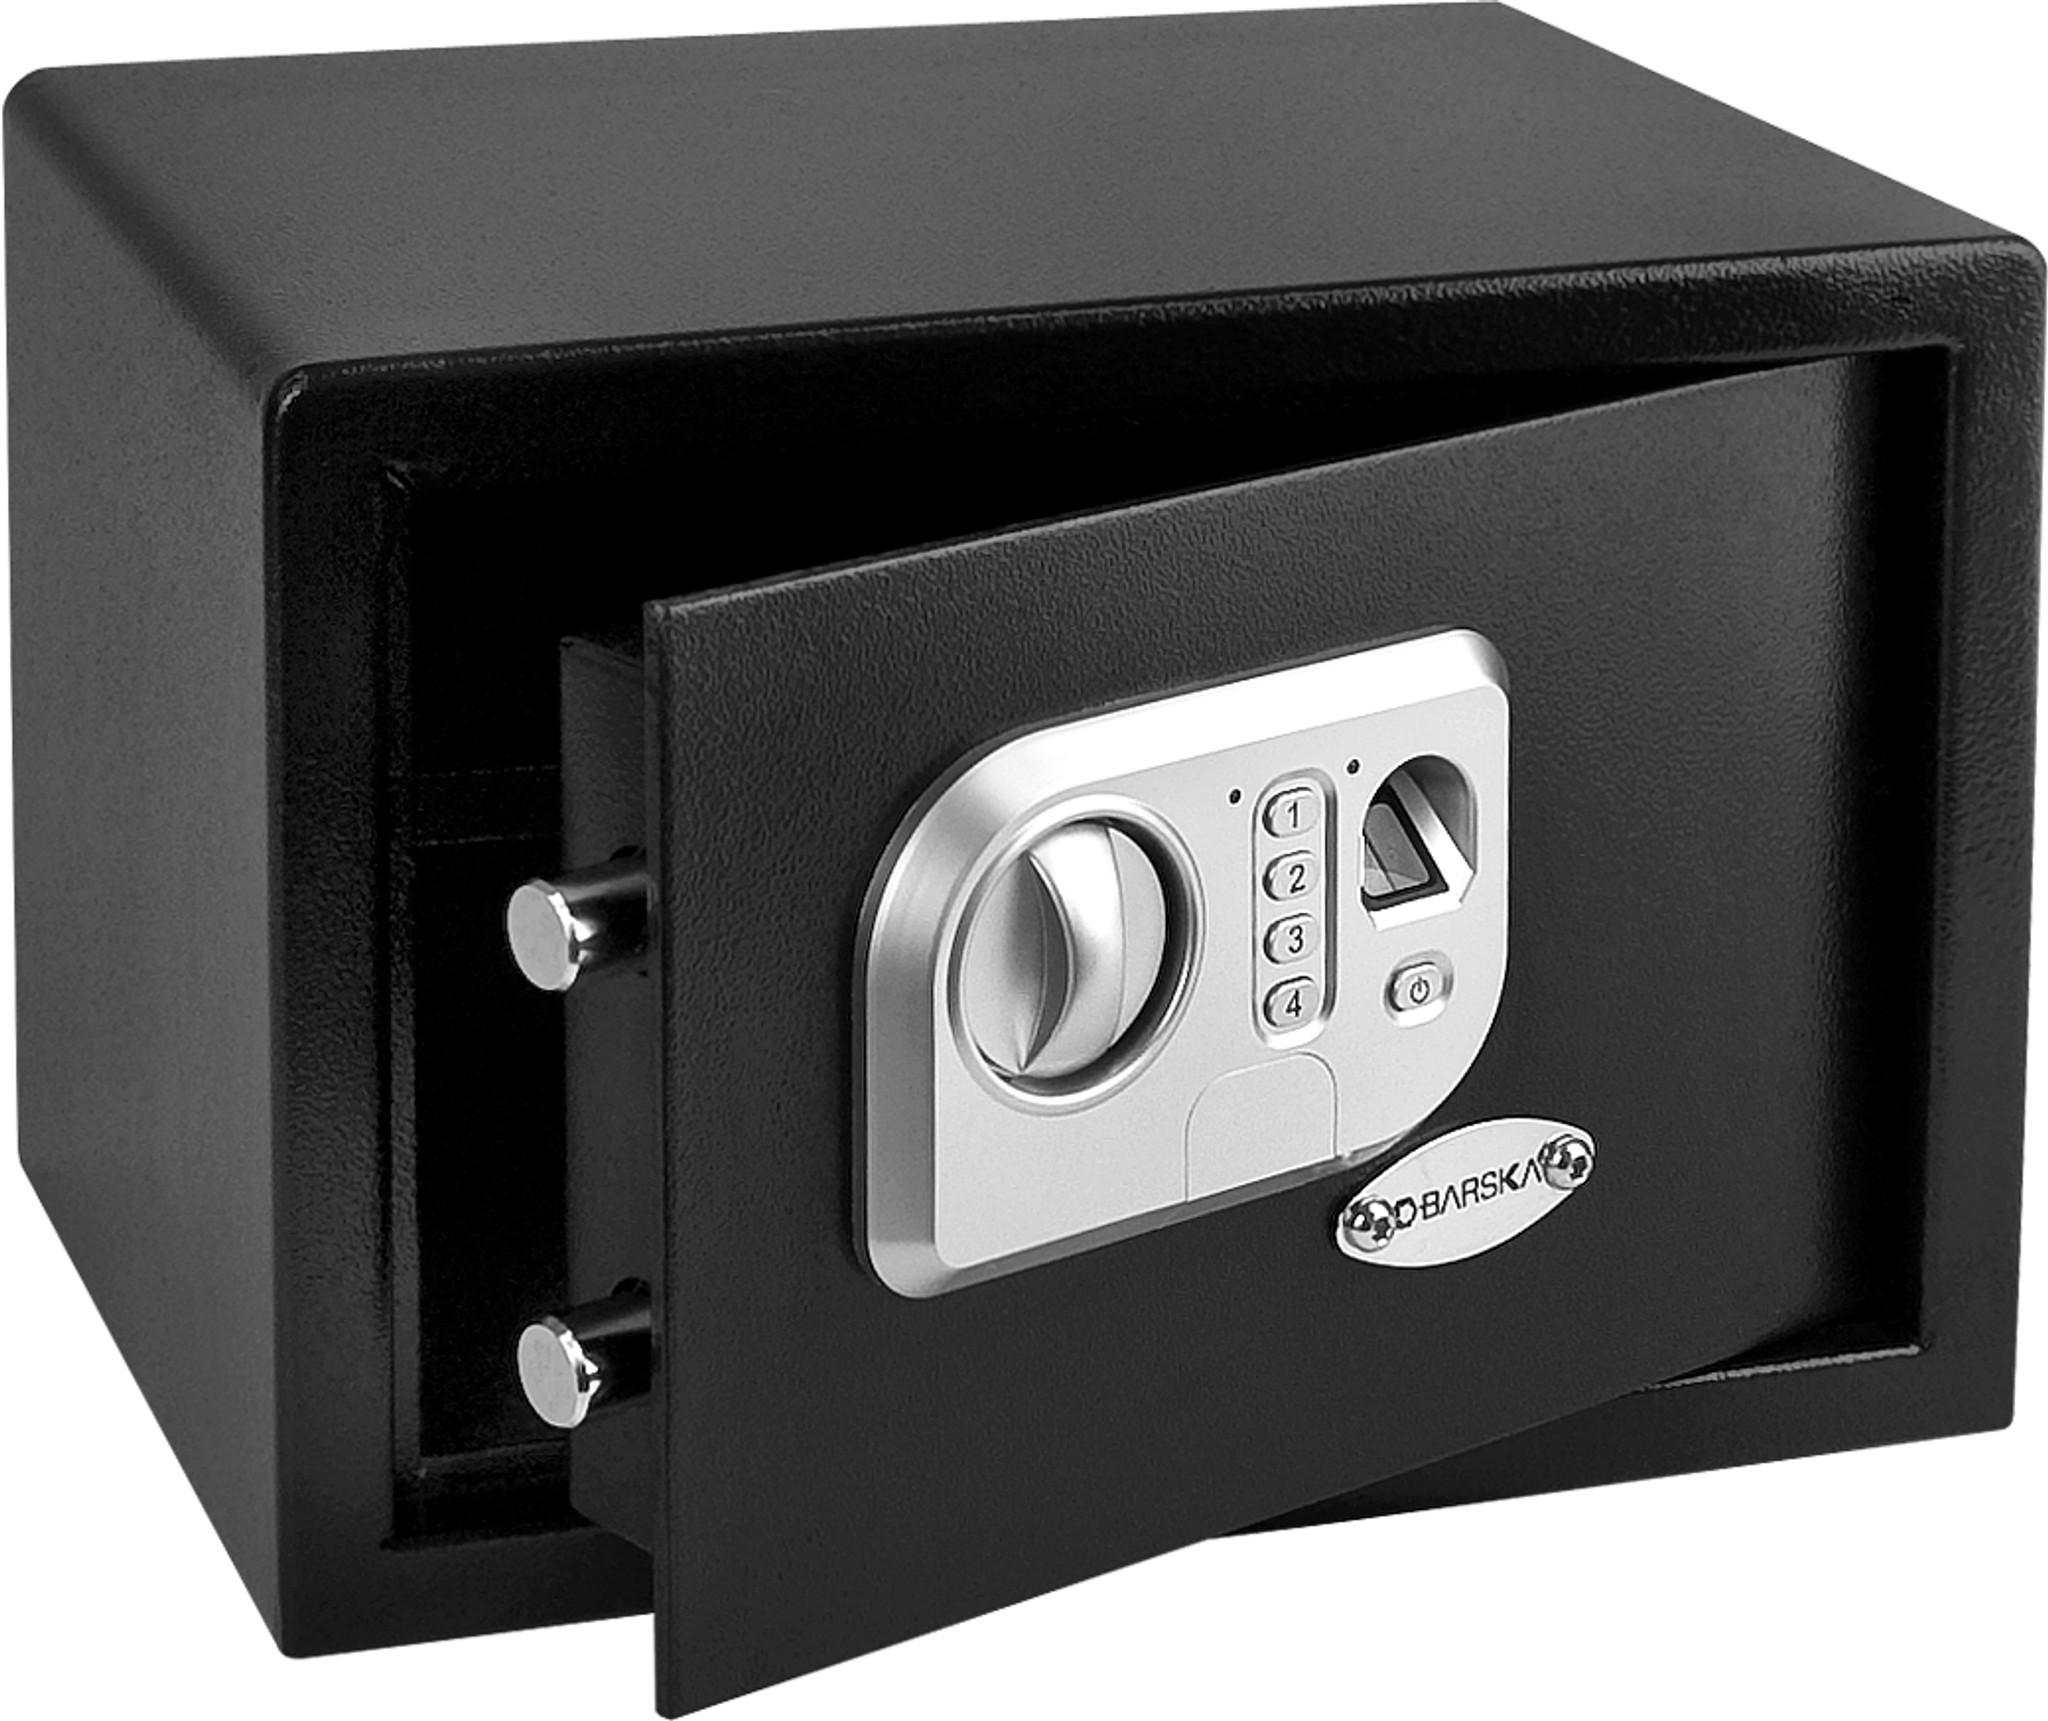 Barska Compact Biometric And Pin Code Safe